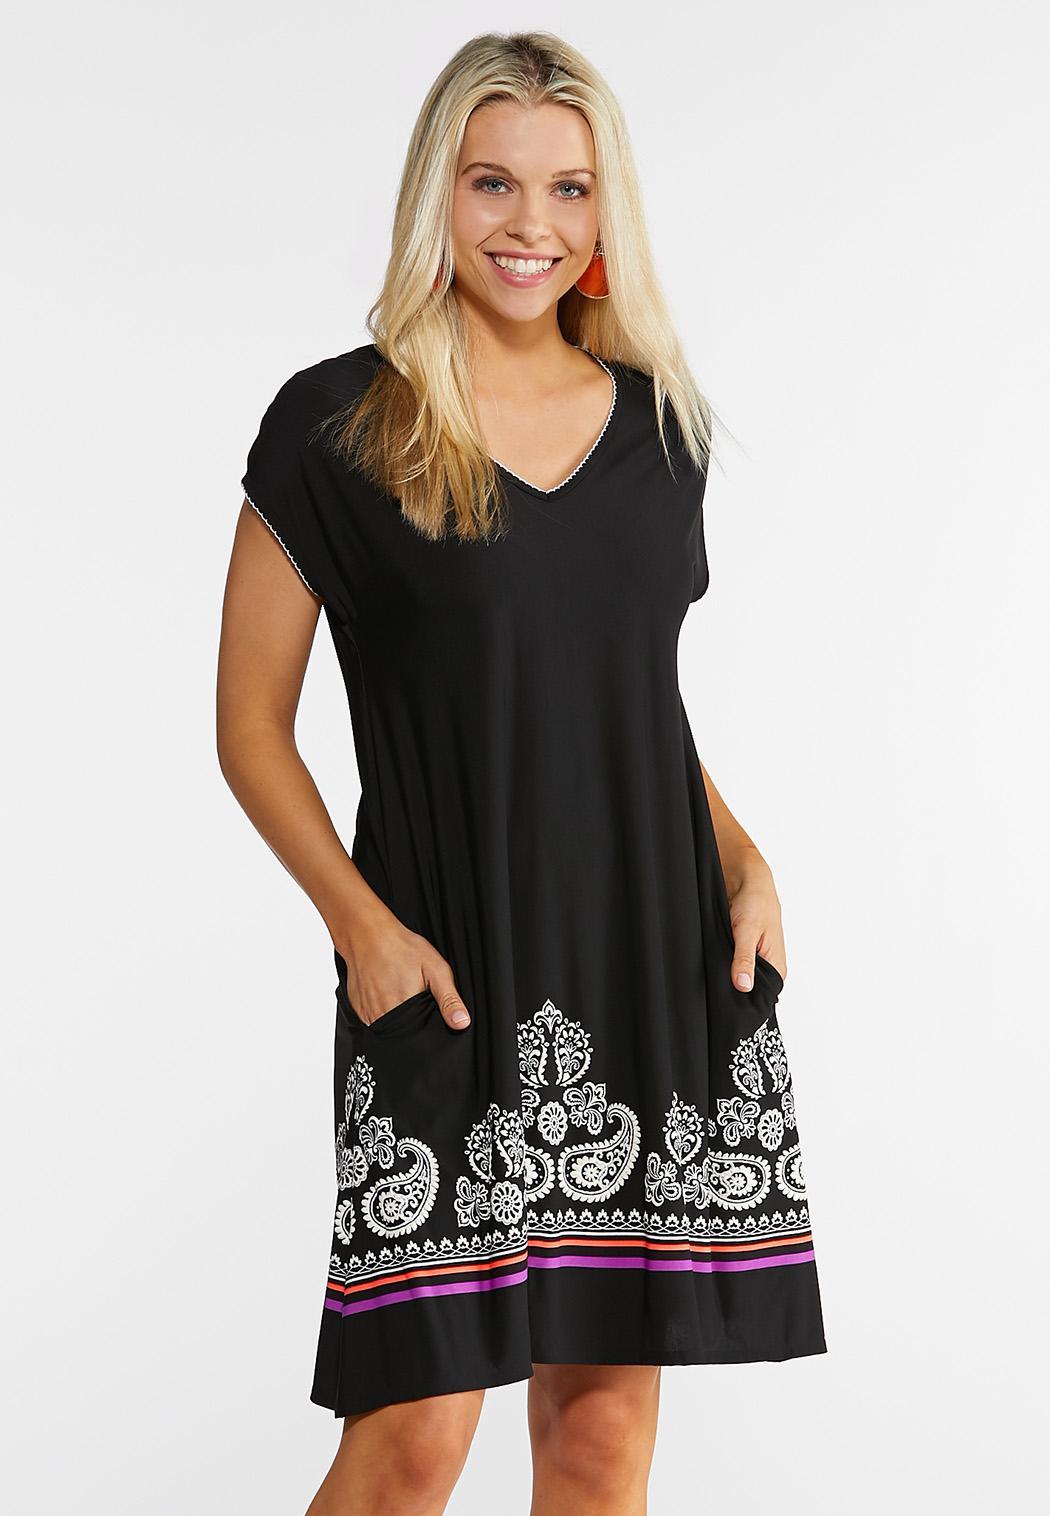 e23322e978a3 Women's Dresses- Fit and Flare, Swing, Maxi, Midi & More Affordable Dresses